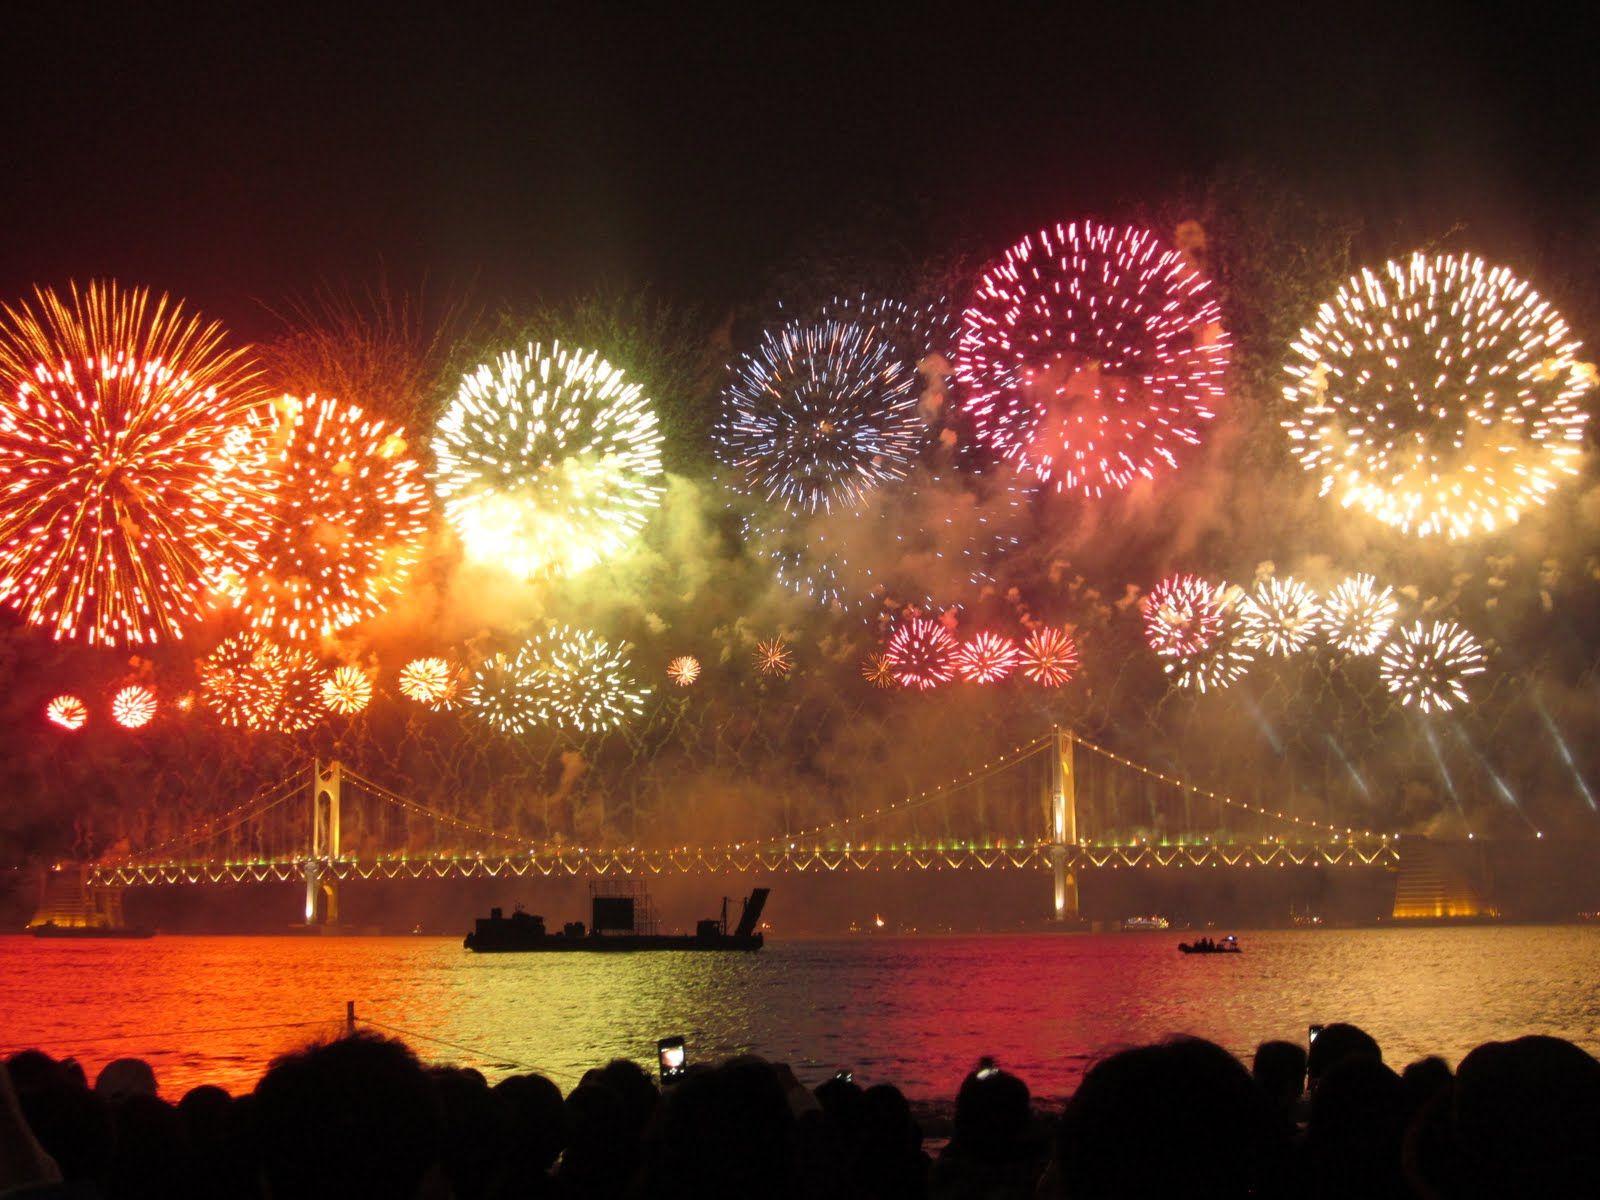 Niagara Falls Ontario Canada Fireworks, New years eve